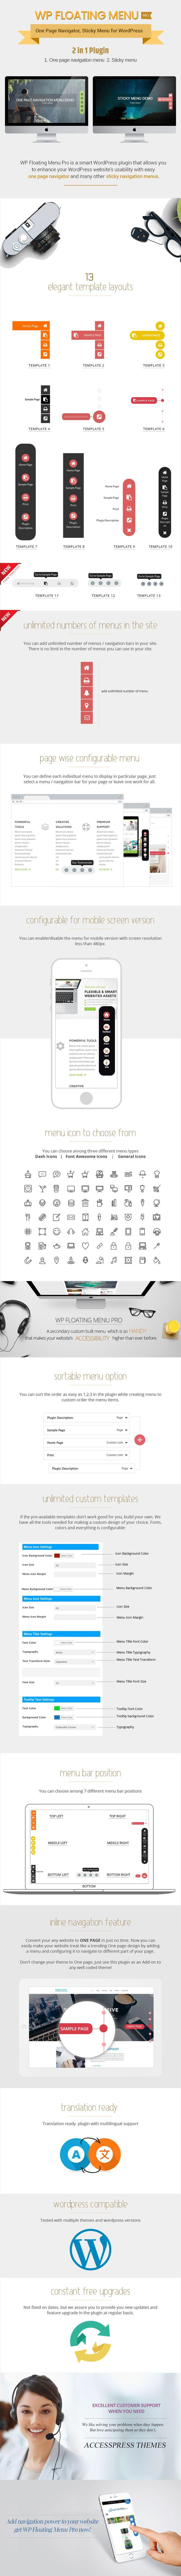 WP Floating Menu Pro - One page navigator, sticky menu for WordPress           - Download here : https://codecanyon.net/item/wp-floating-menu-pro-one-page-navigator-sticky-menu-for-wordpress/17646227?ref=pxcr